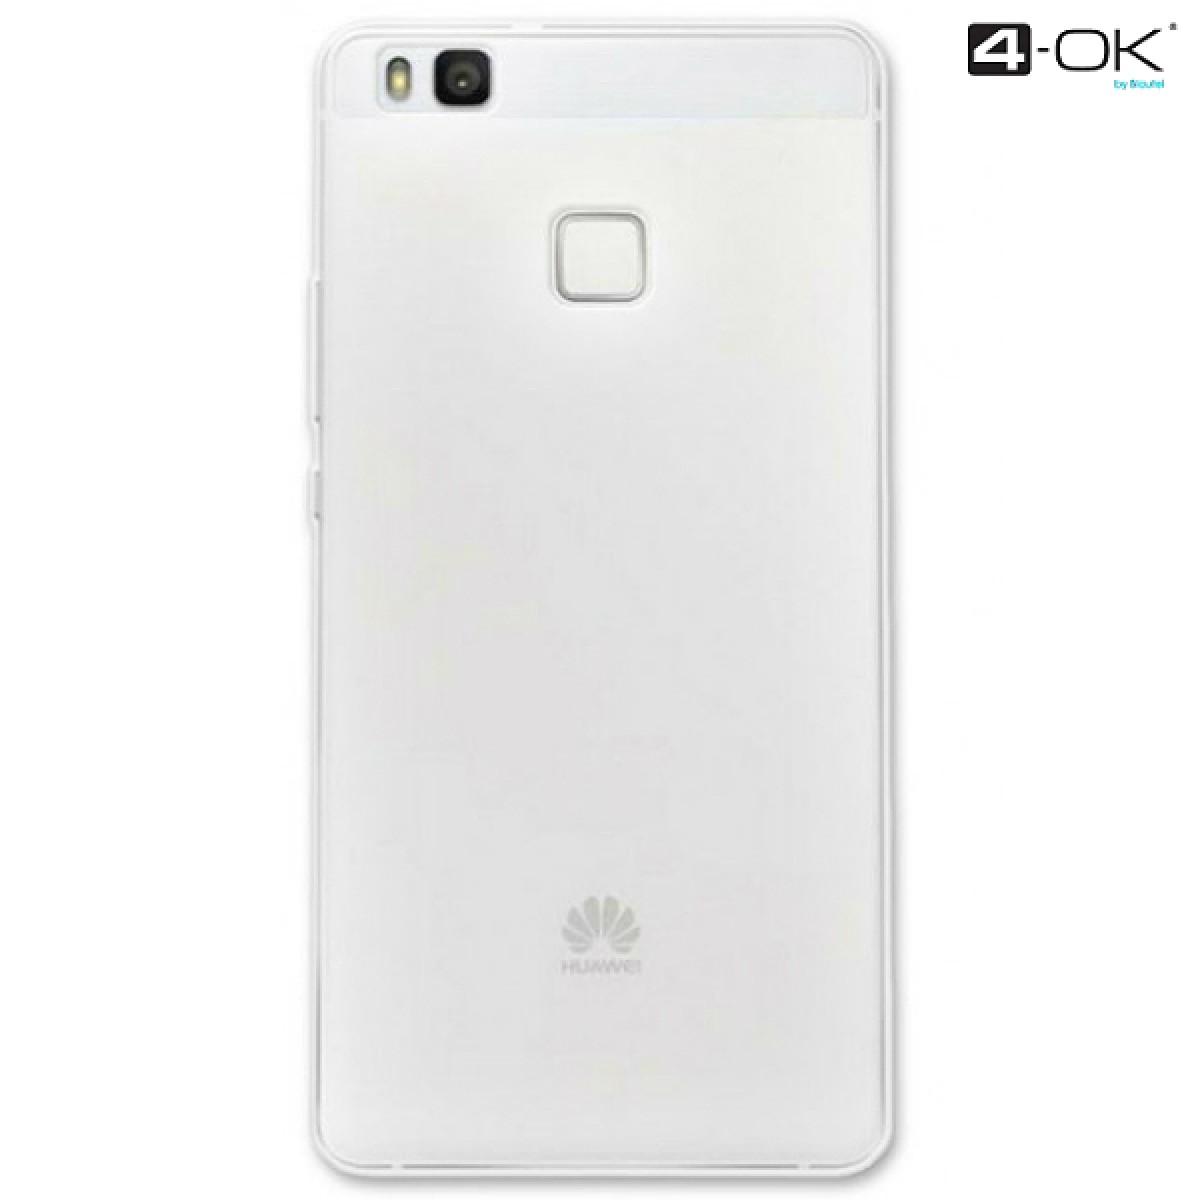 4-OK Protek 0.2 Ultra Slim Case - Huawei P9 Lite Transparent